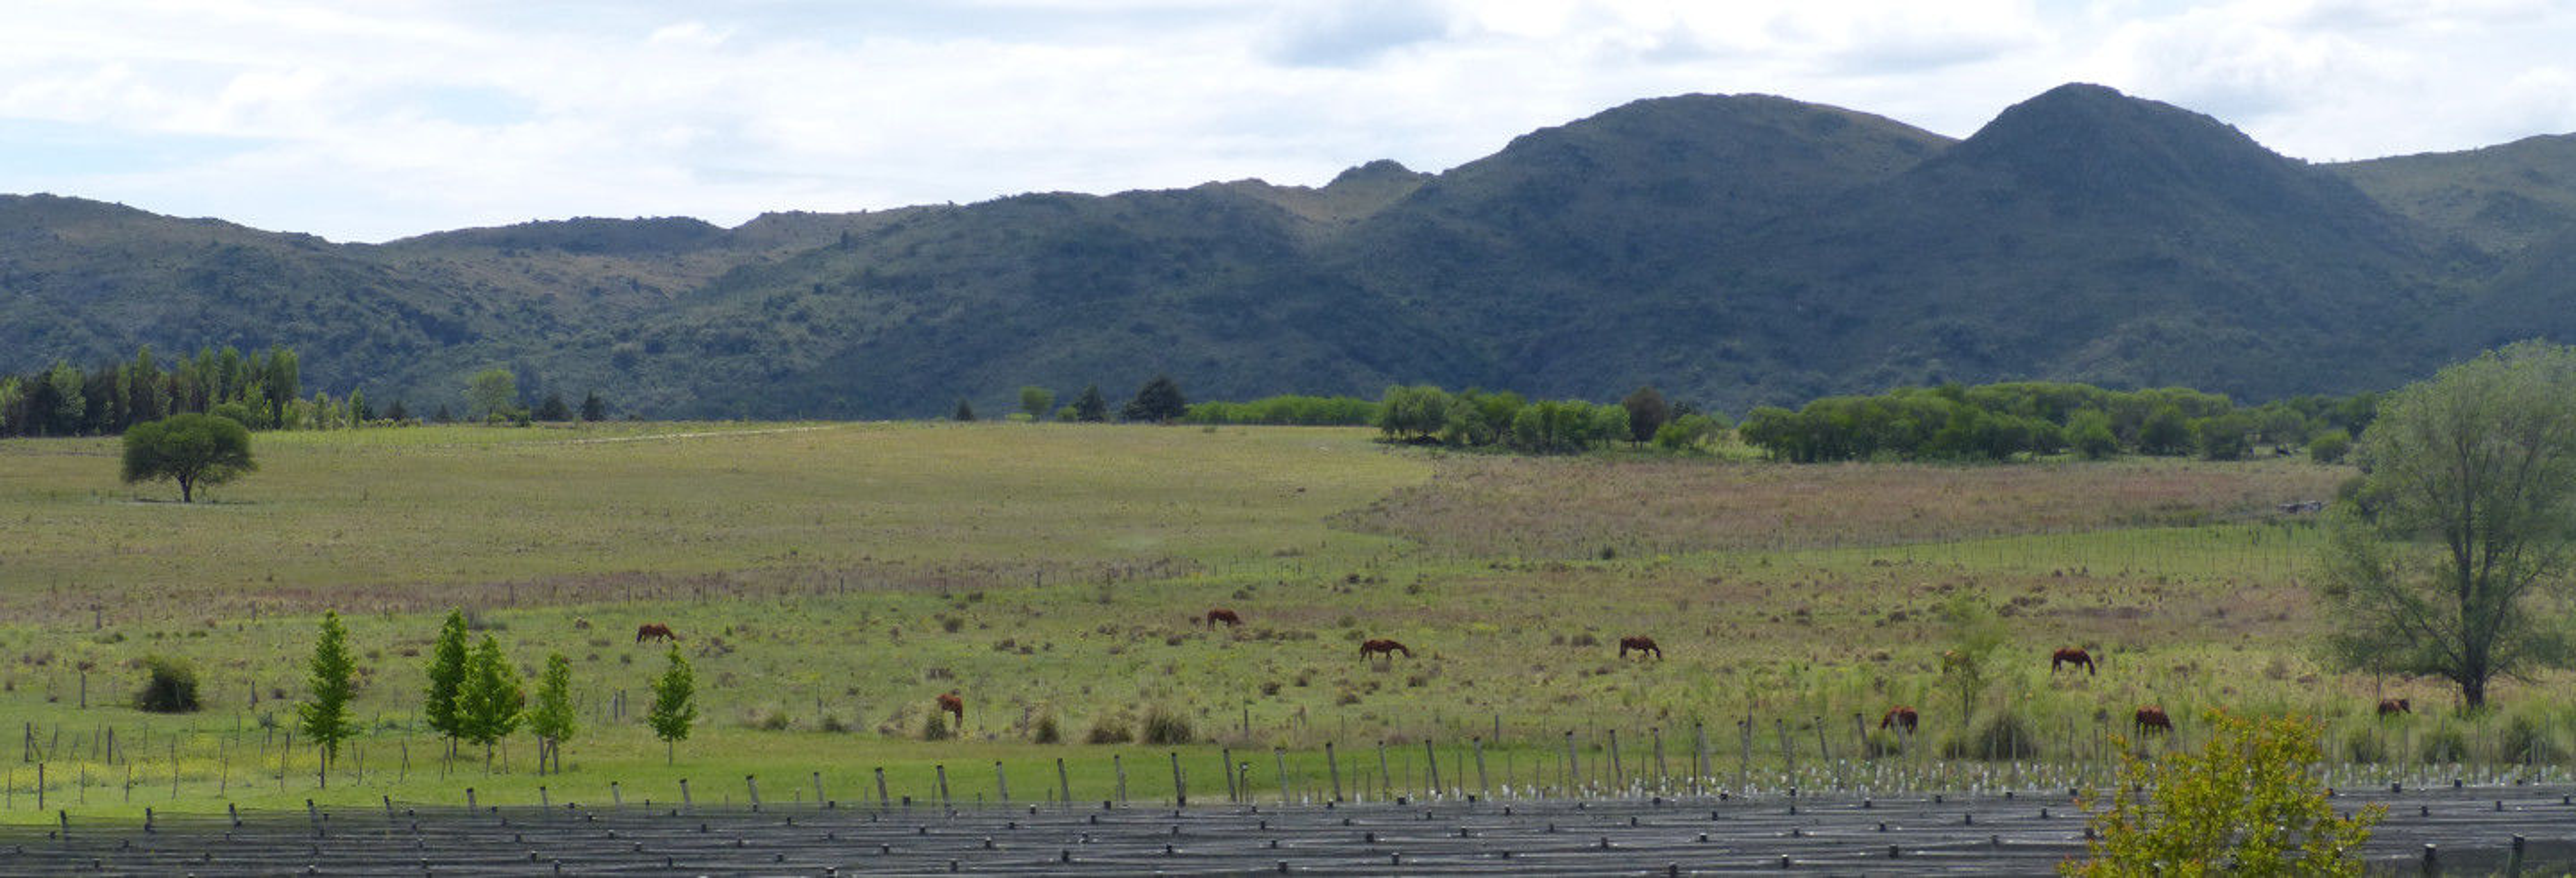 Valle de Calamuchita Winery Tour